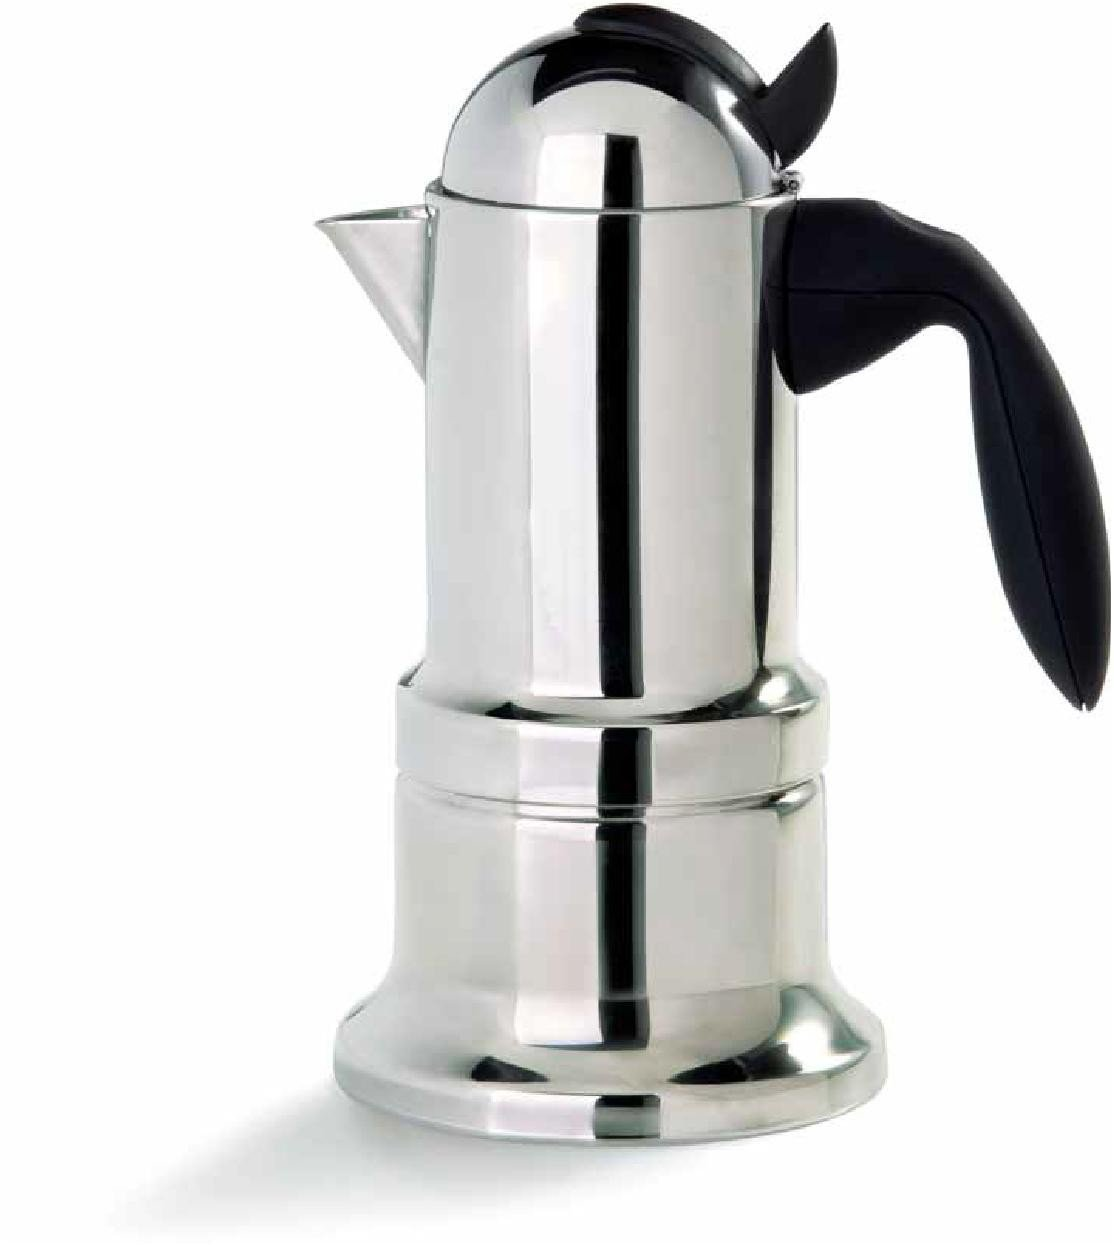 Stovetop Espresso Maker - Vev Vigano Kontessa Nuova 4 Cup Size